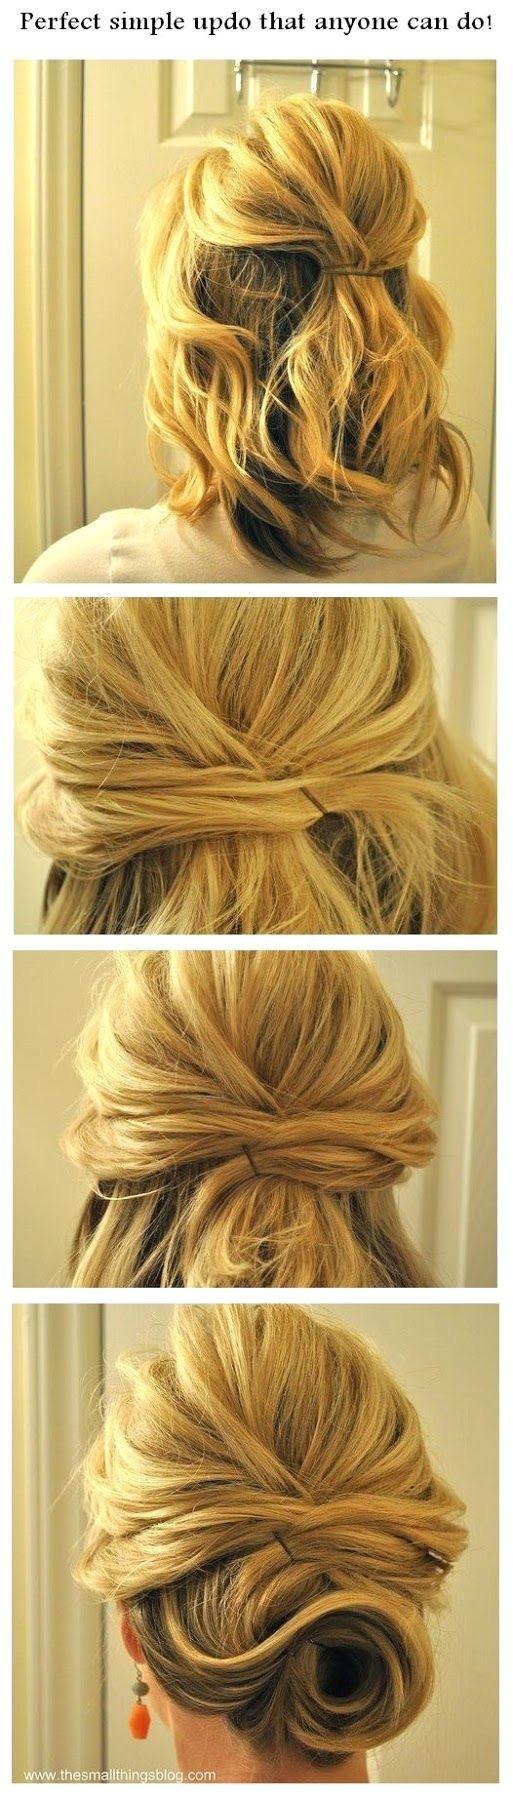 step by step hairstyles for medium length hair